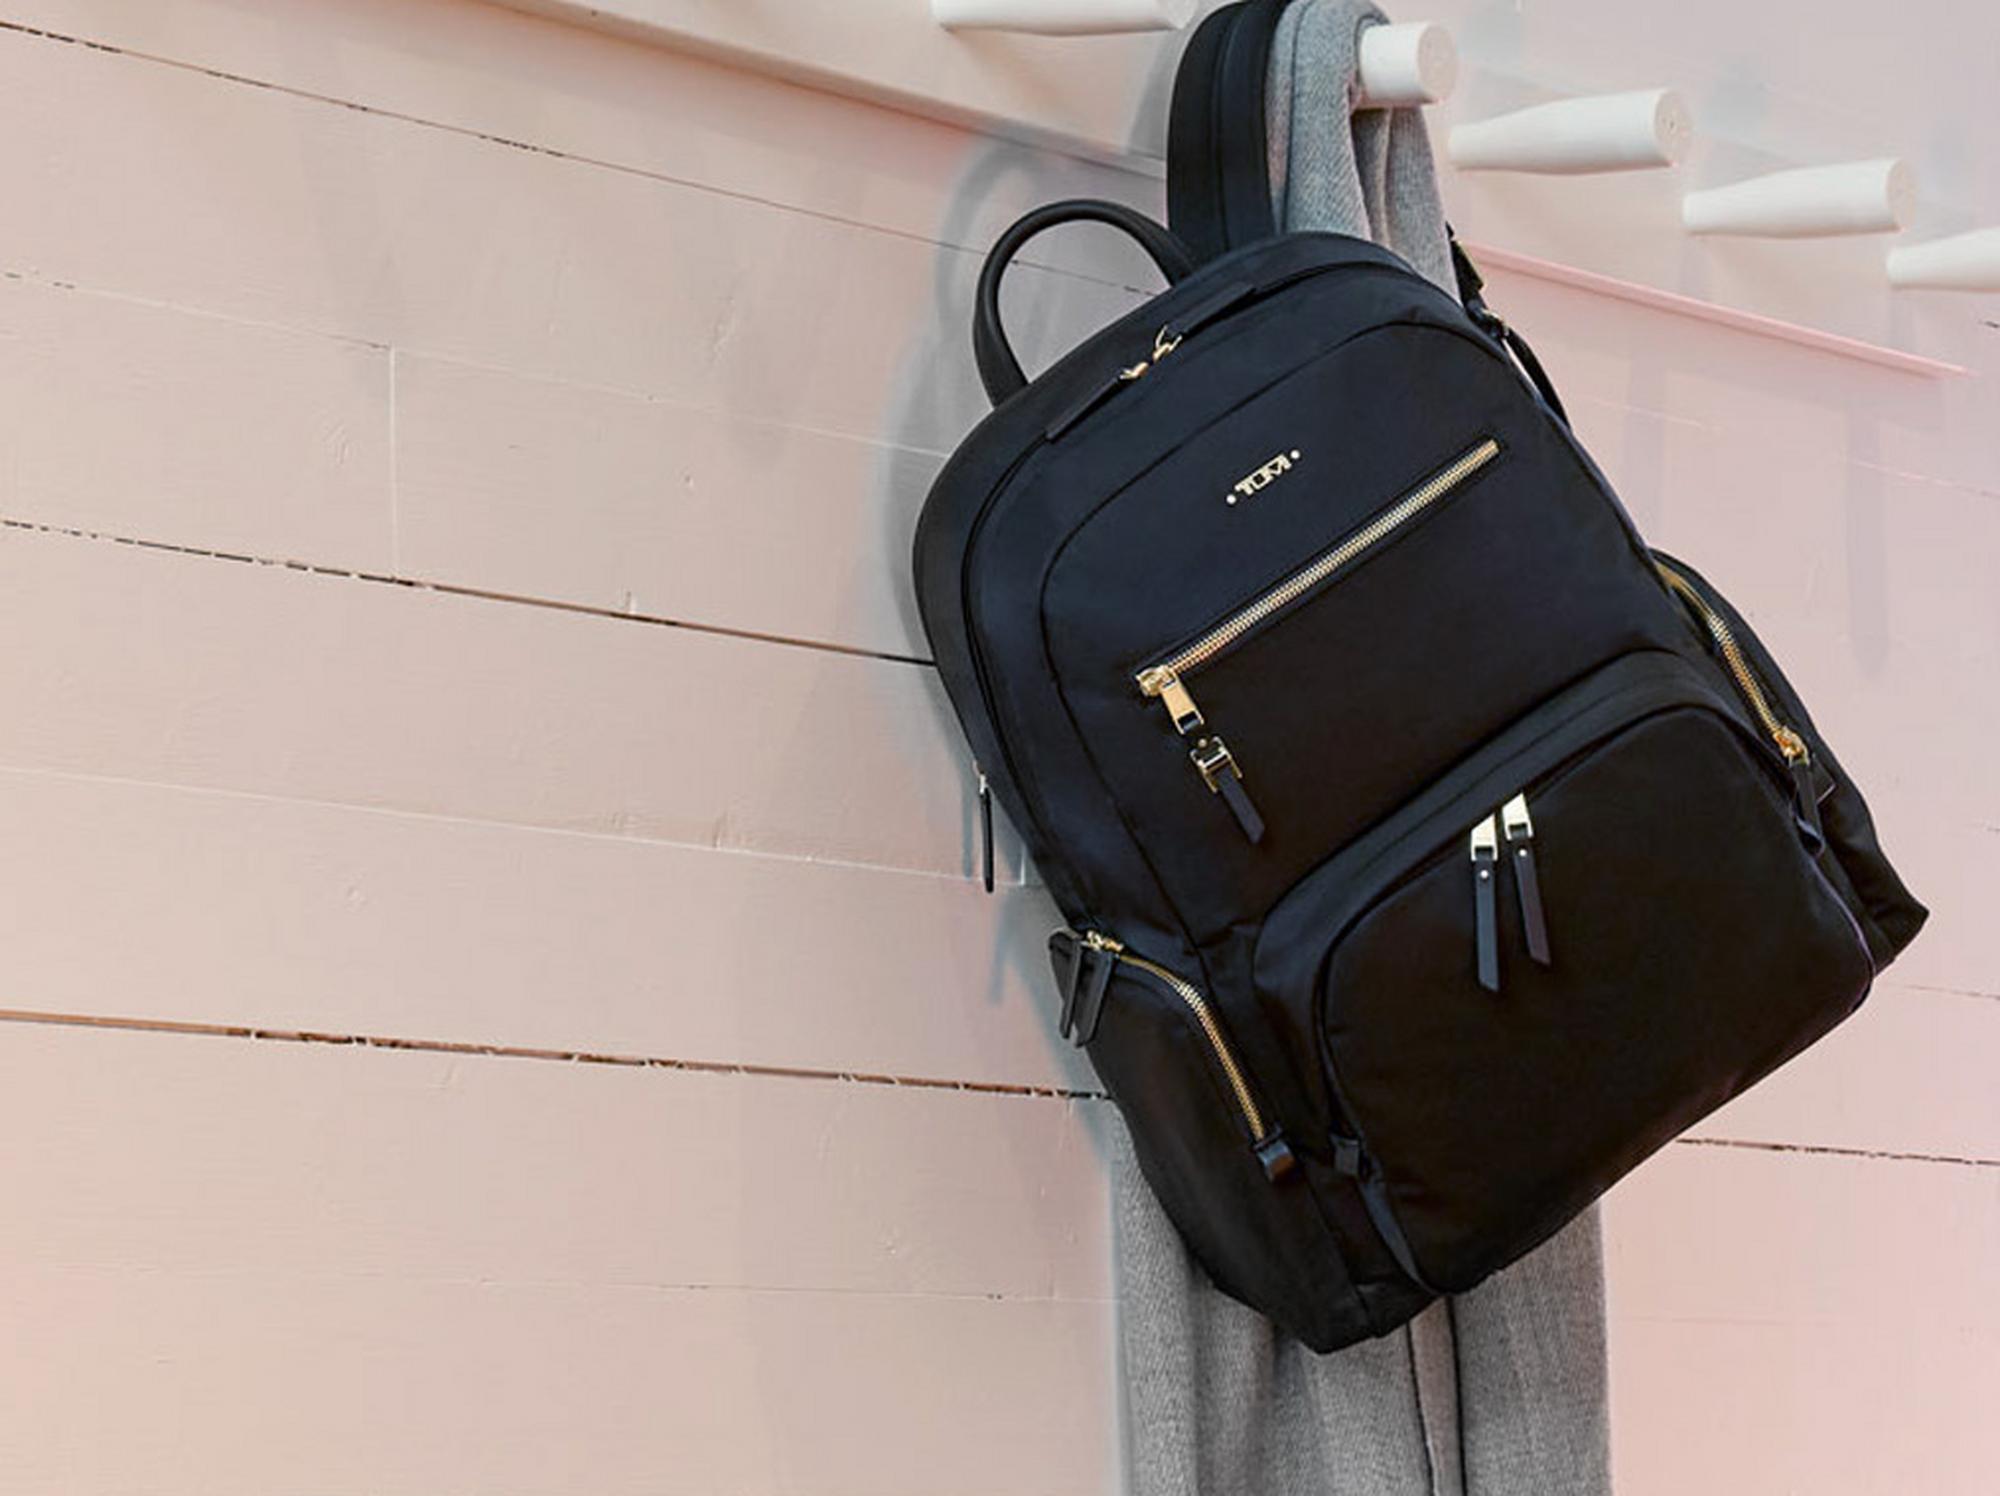 Luggage, Backpacks, Bags & More - TUMI CA